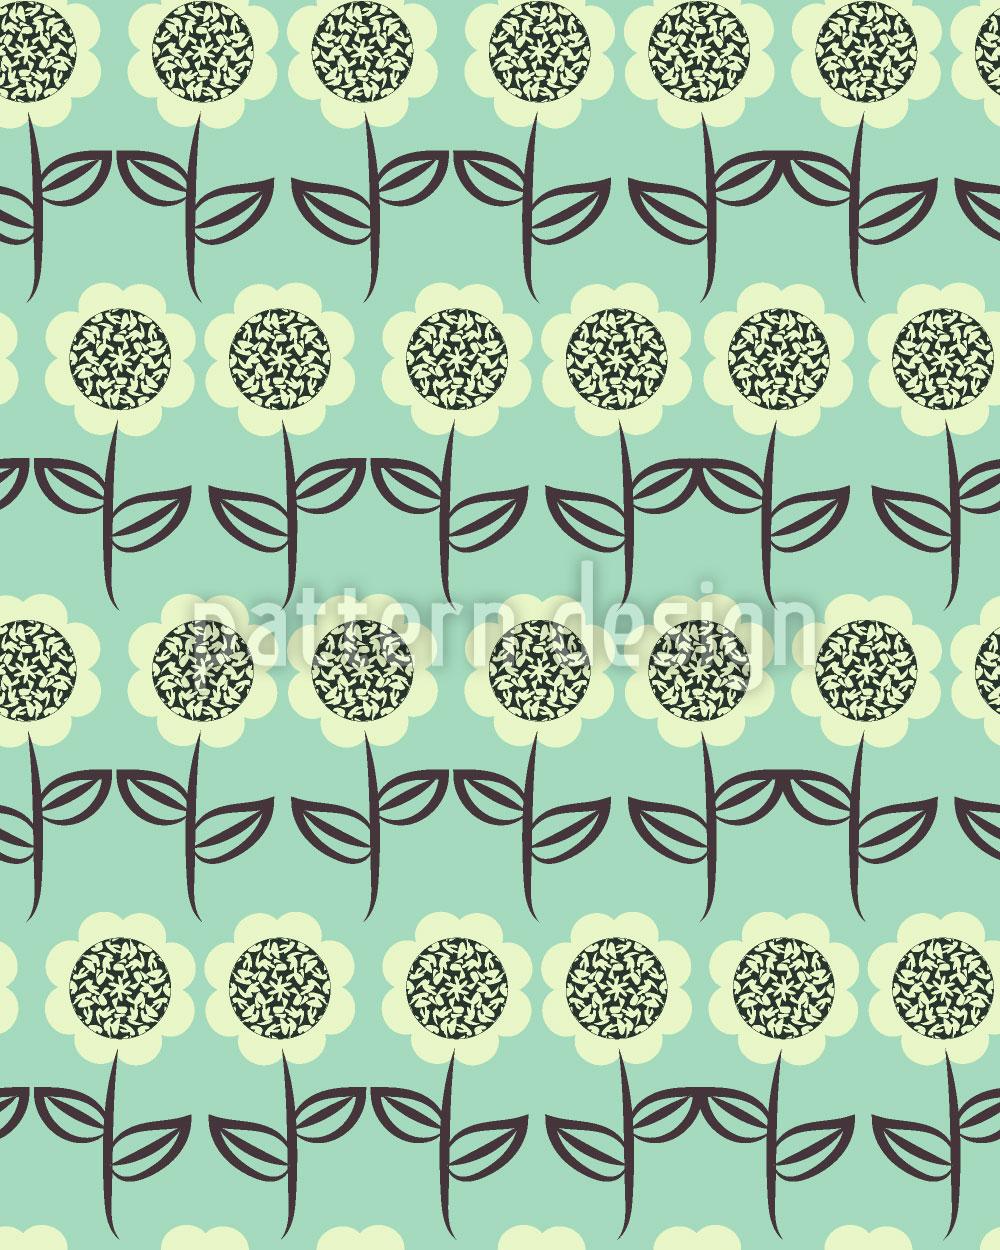 Designtapete Sonnenblumen Reihen